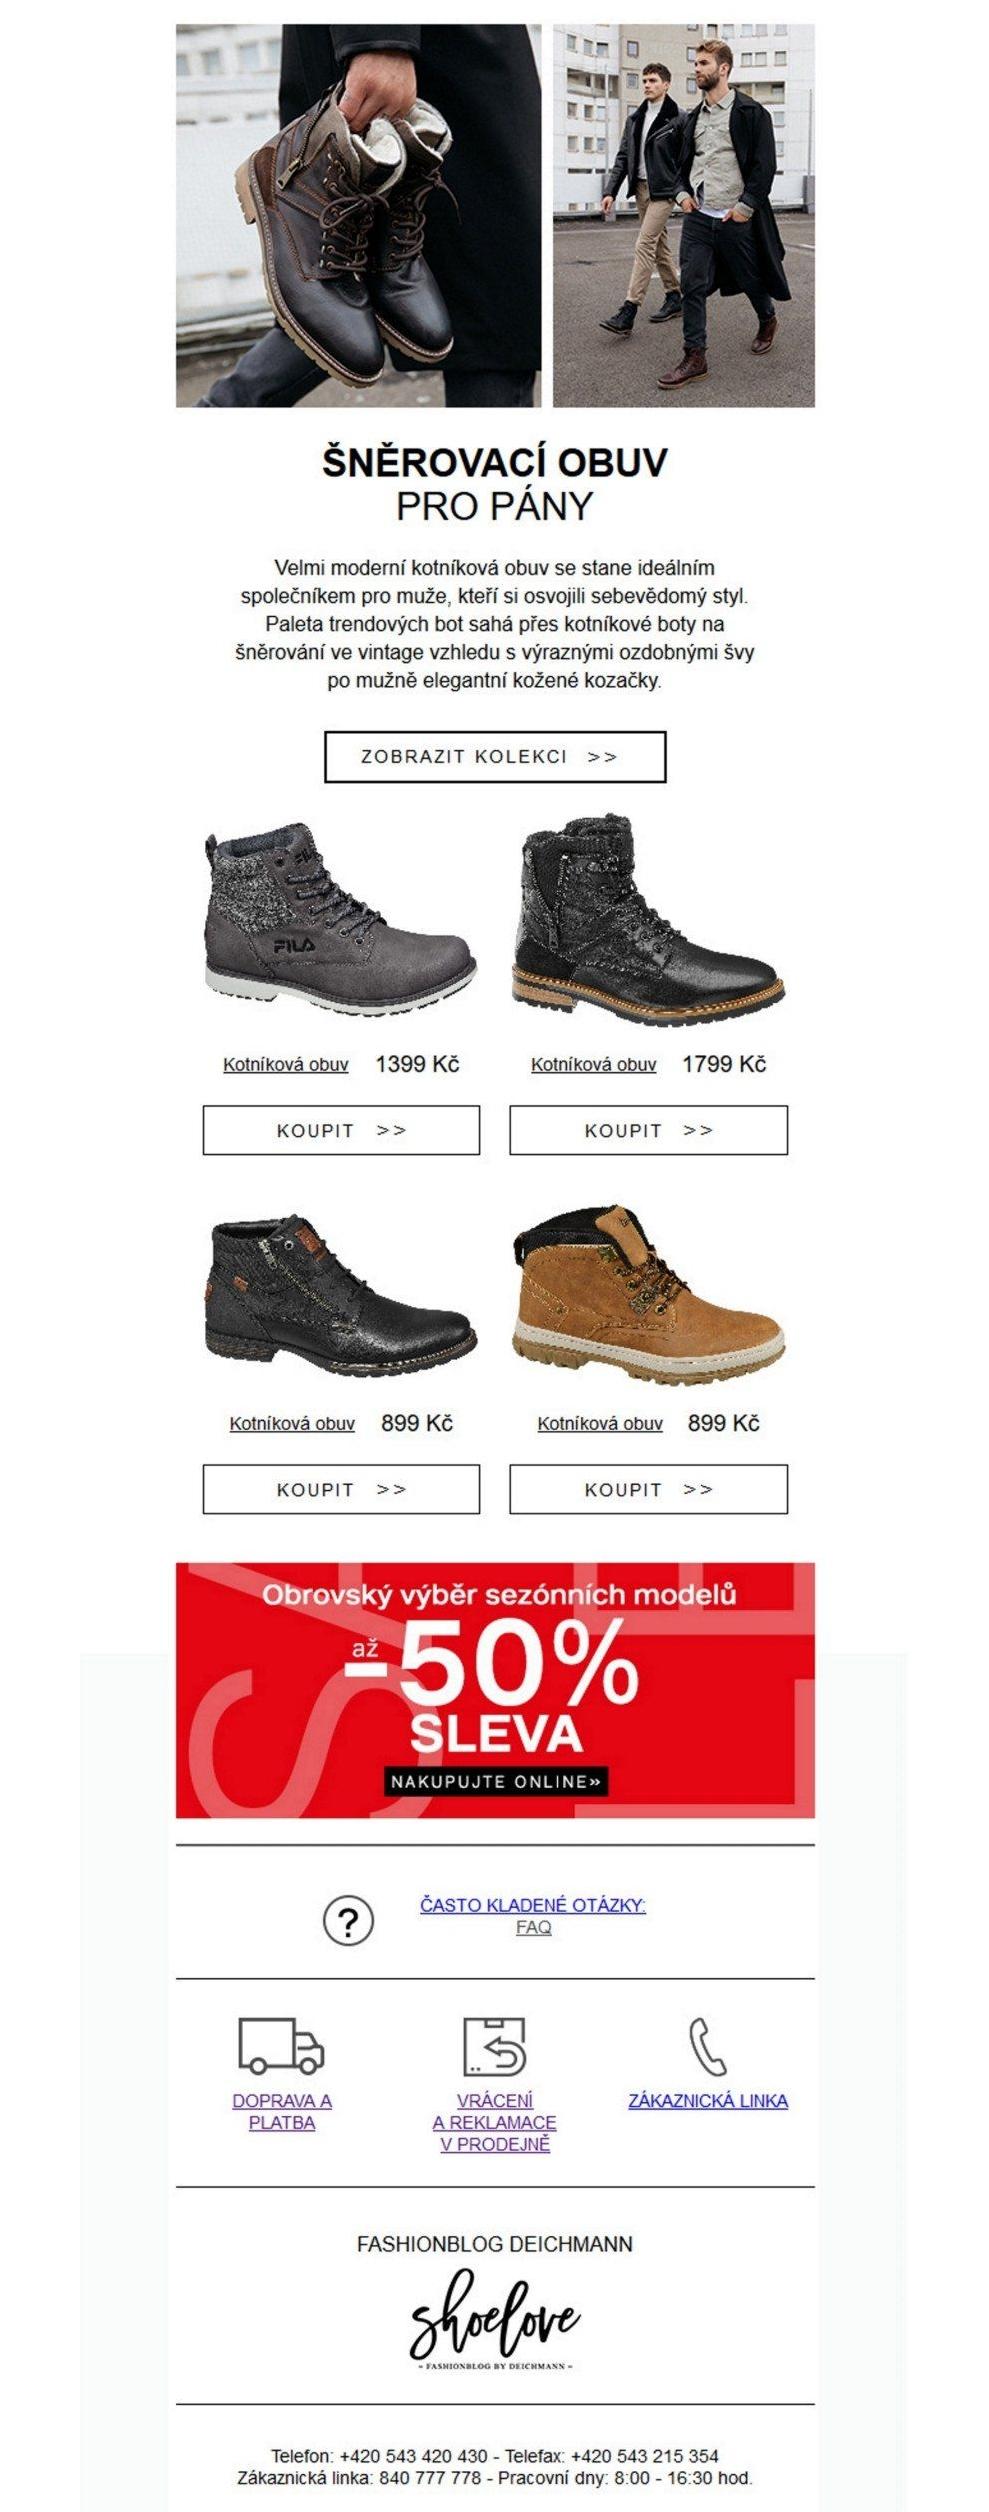 44b0ee9bc8 Široká nabídka obuvi a kabelek Deichmann v akci DEICHMANN od 21.12.2018